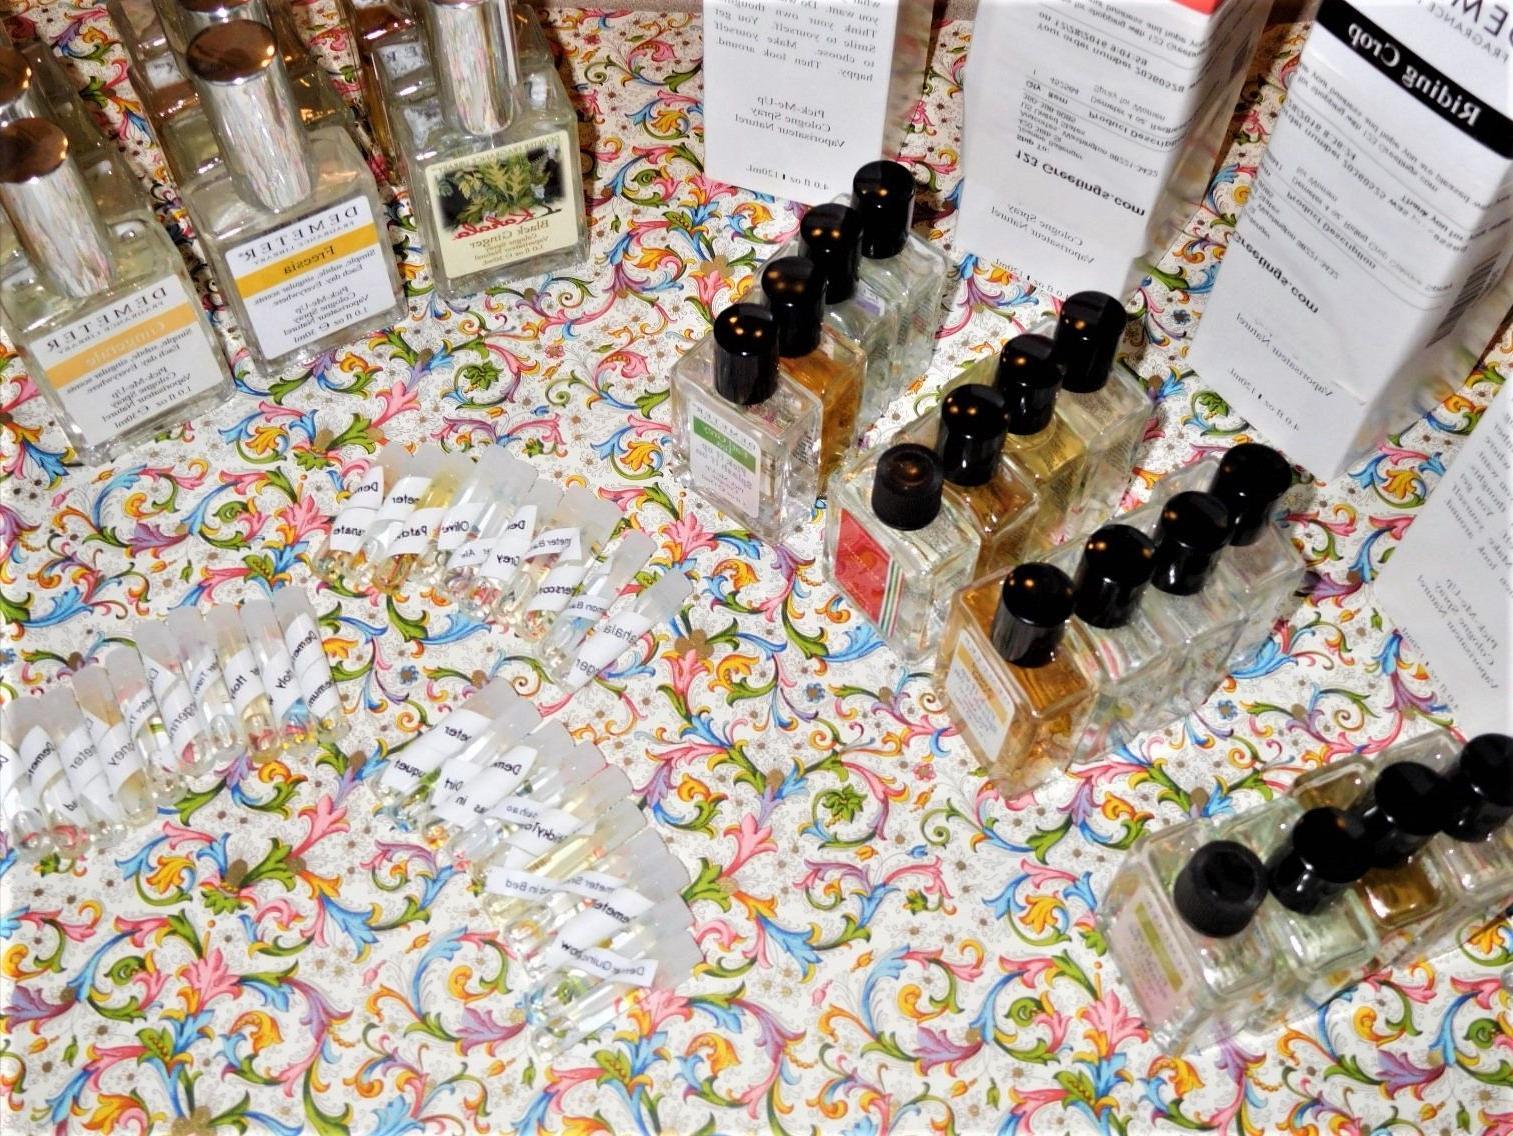 fragrances big fun and rambunctious 34 samples